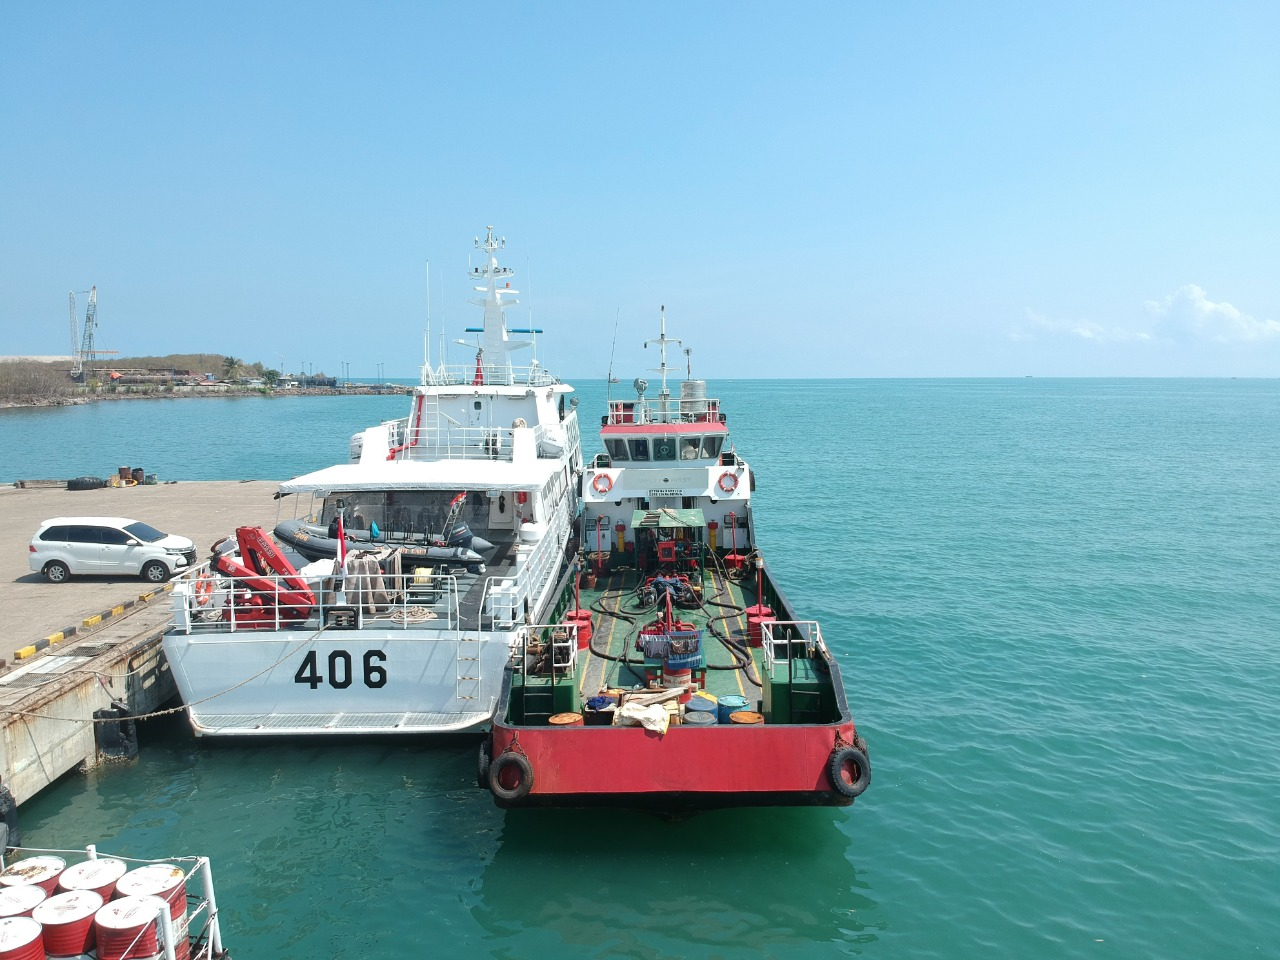 Empat Hari Nginap di Hotel The Royale Krakatau Cilegon, WNA Pakistan Kapten Kapal Tangker Pengangkut Gasoil Milik Pertamina Positif Covid-19